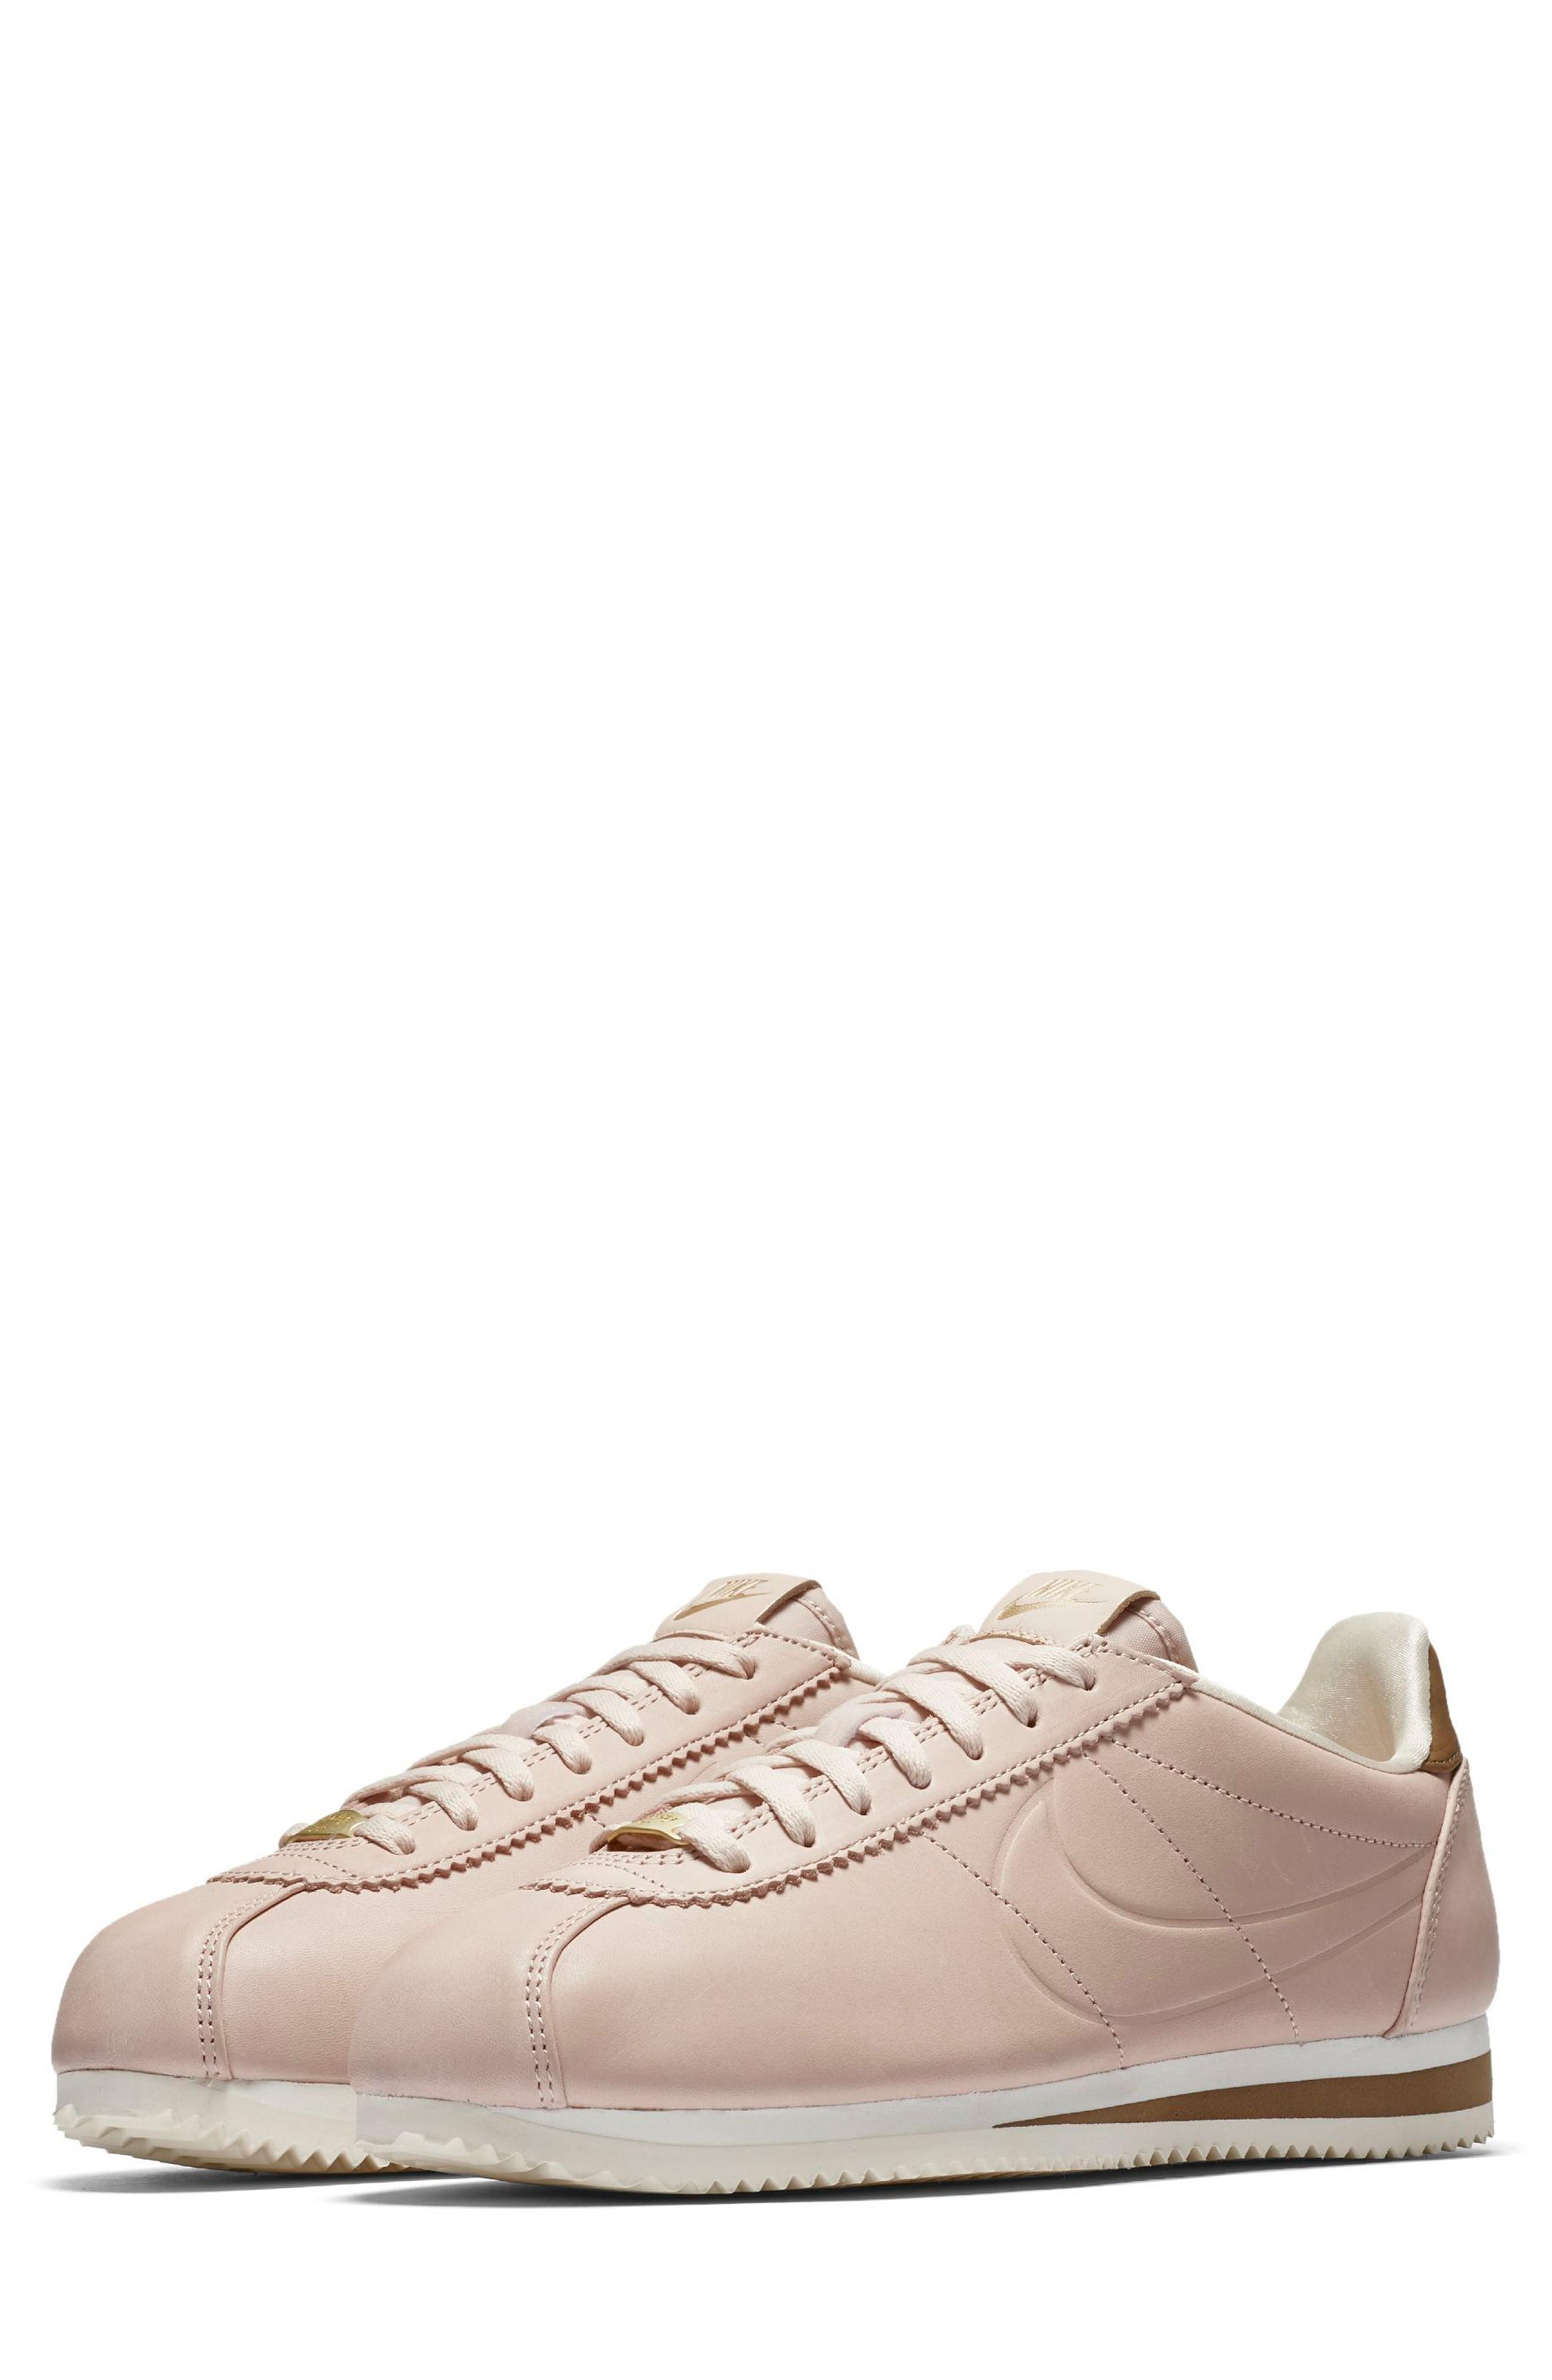 373514334492 Nike X Maria Sharapova La Cortez Premium Sneaker In Particle Beige Particle  Beige